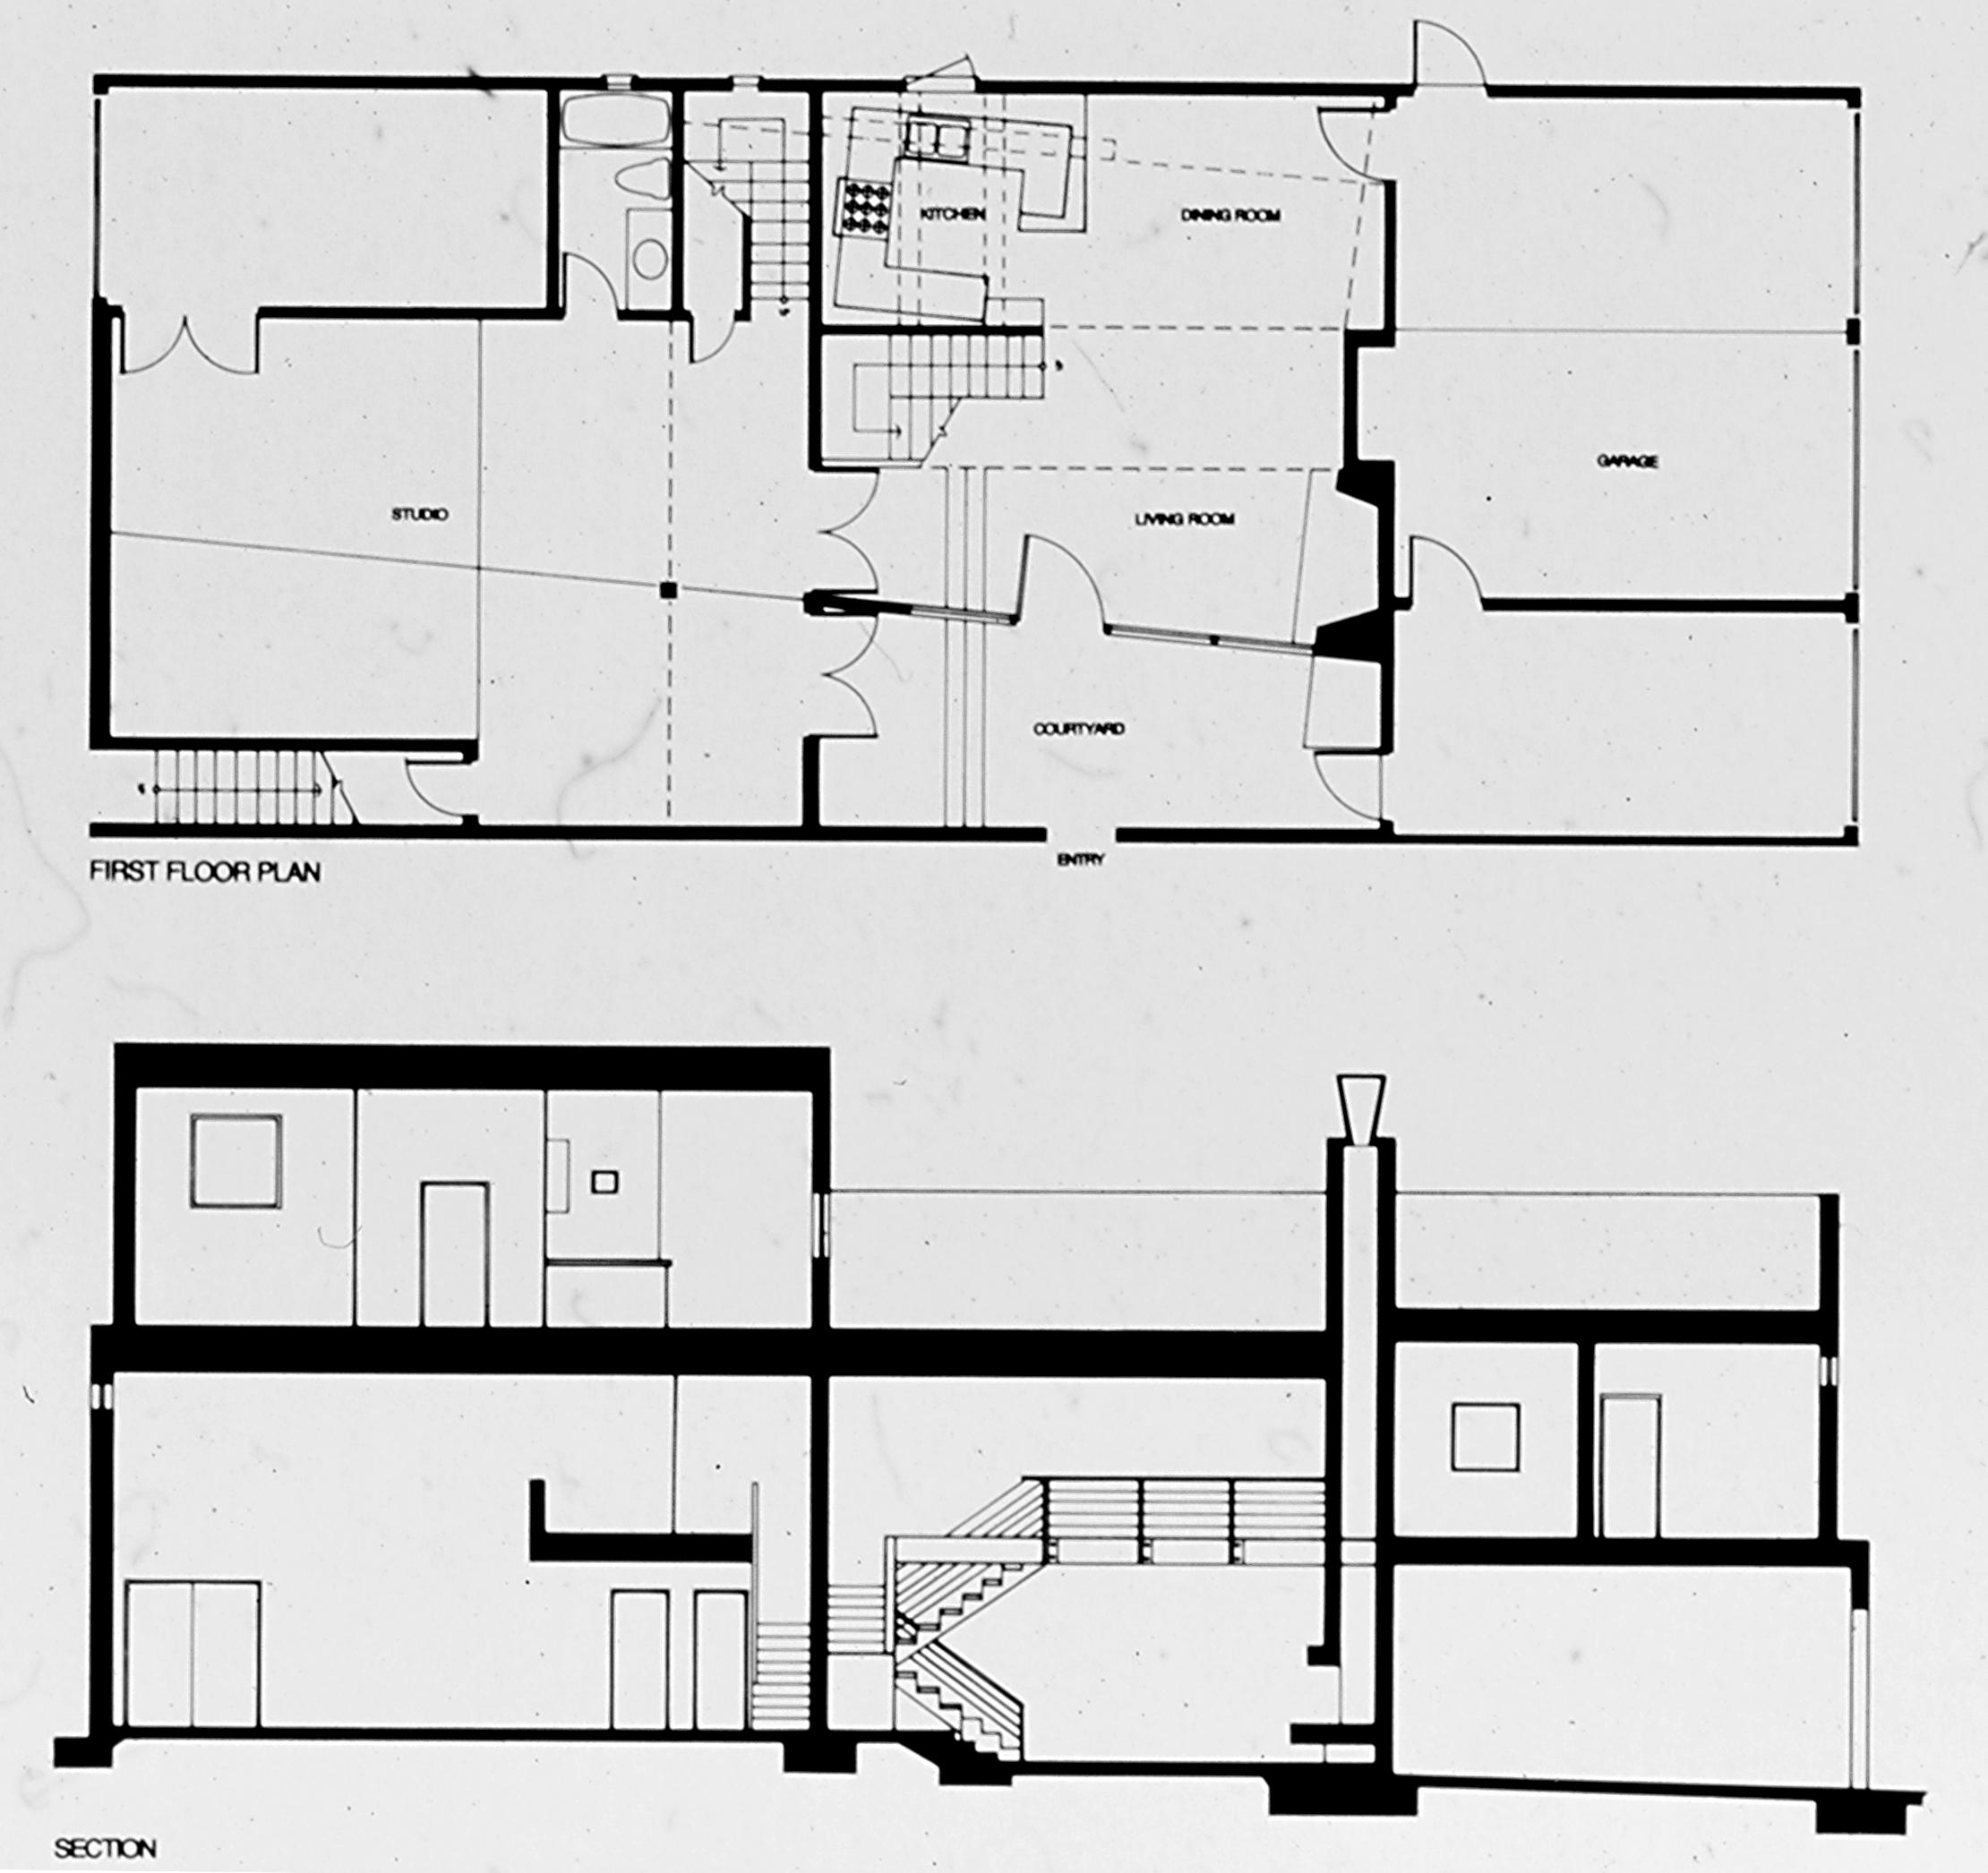 S.E.A.-Studio-Environmental-Architecture-David-Hertz-FAIA-Venable-House-Venice-Beach-sustainable-regenerative-restorative-design-residential-contemporary-modern-passive-systems-recycled-wood-concrete-green-building-canal-beachhouse-studioea-drawing-1.jpg